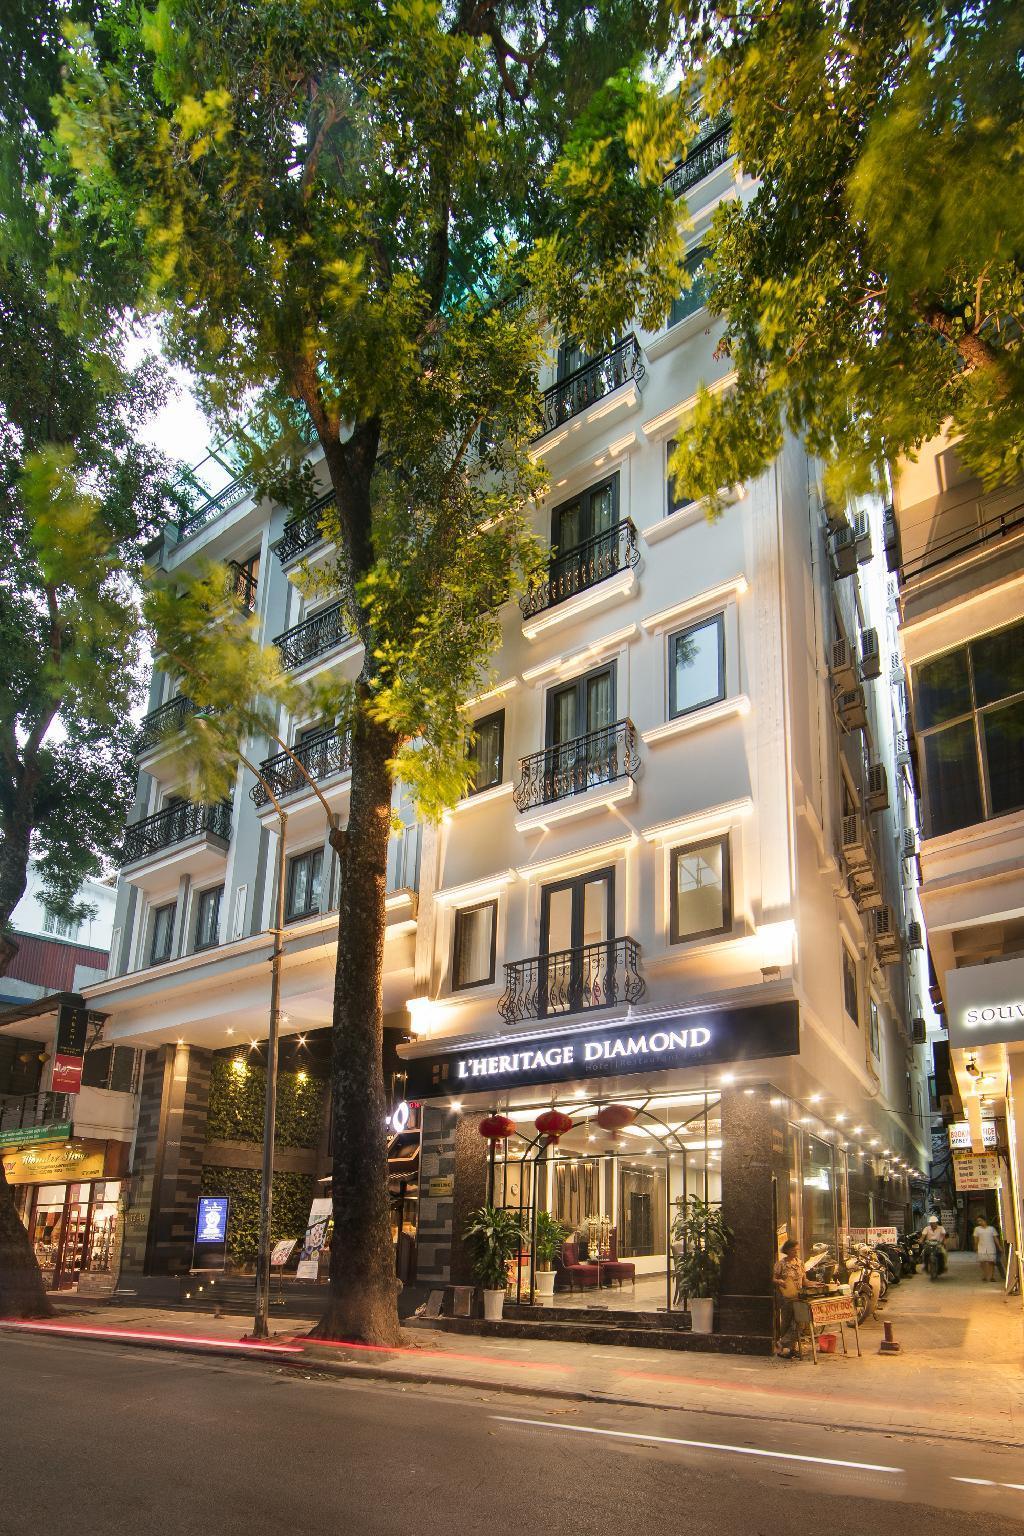 hanoi l heritage diamond hotel spa in vietnam room deals photos rh agoda com